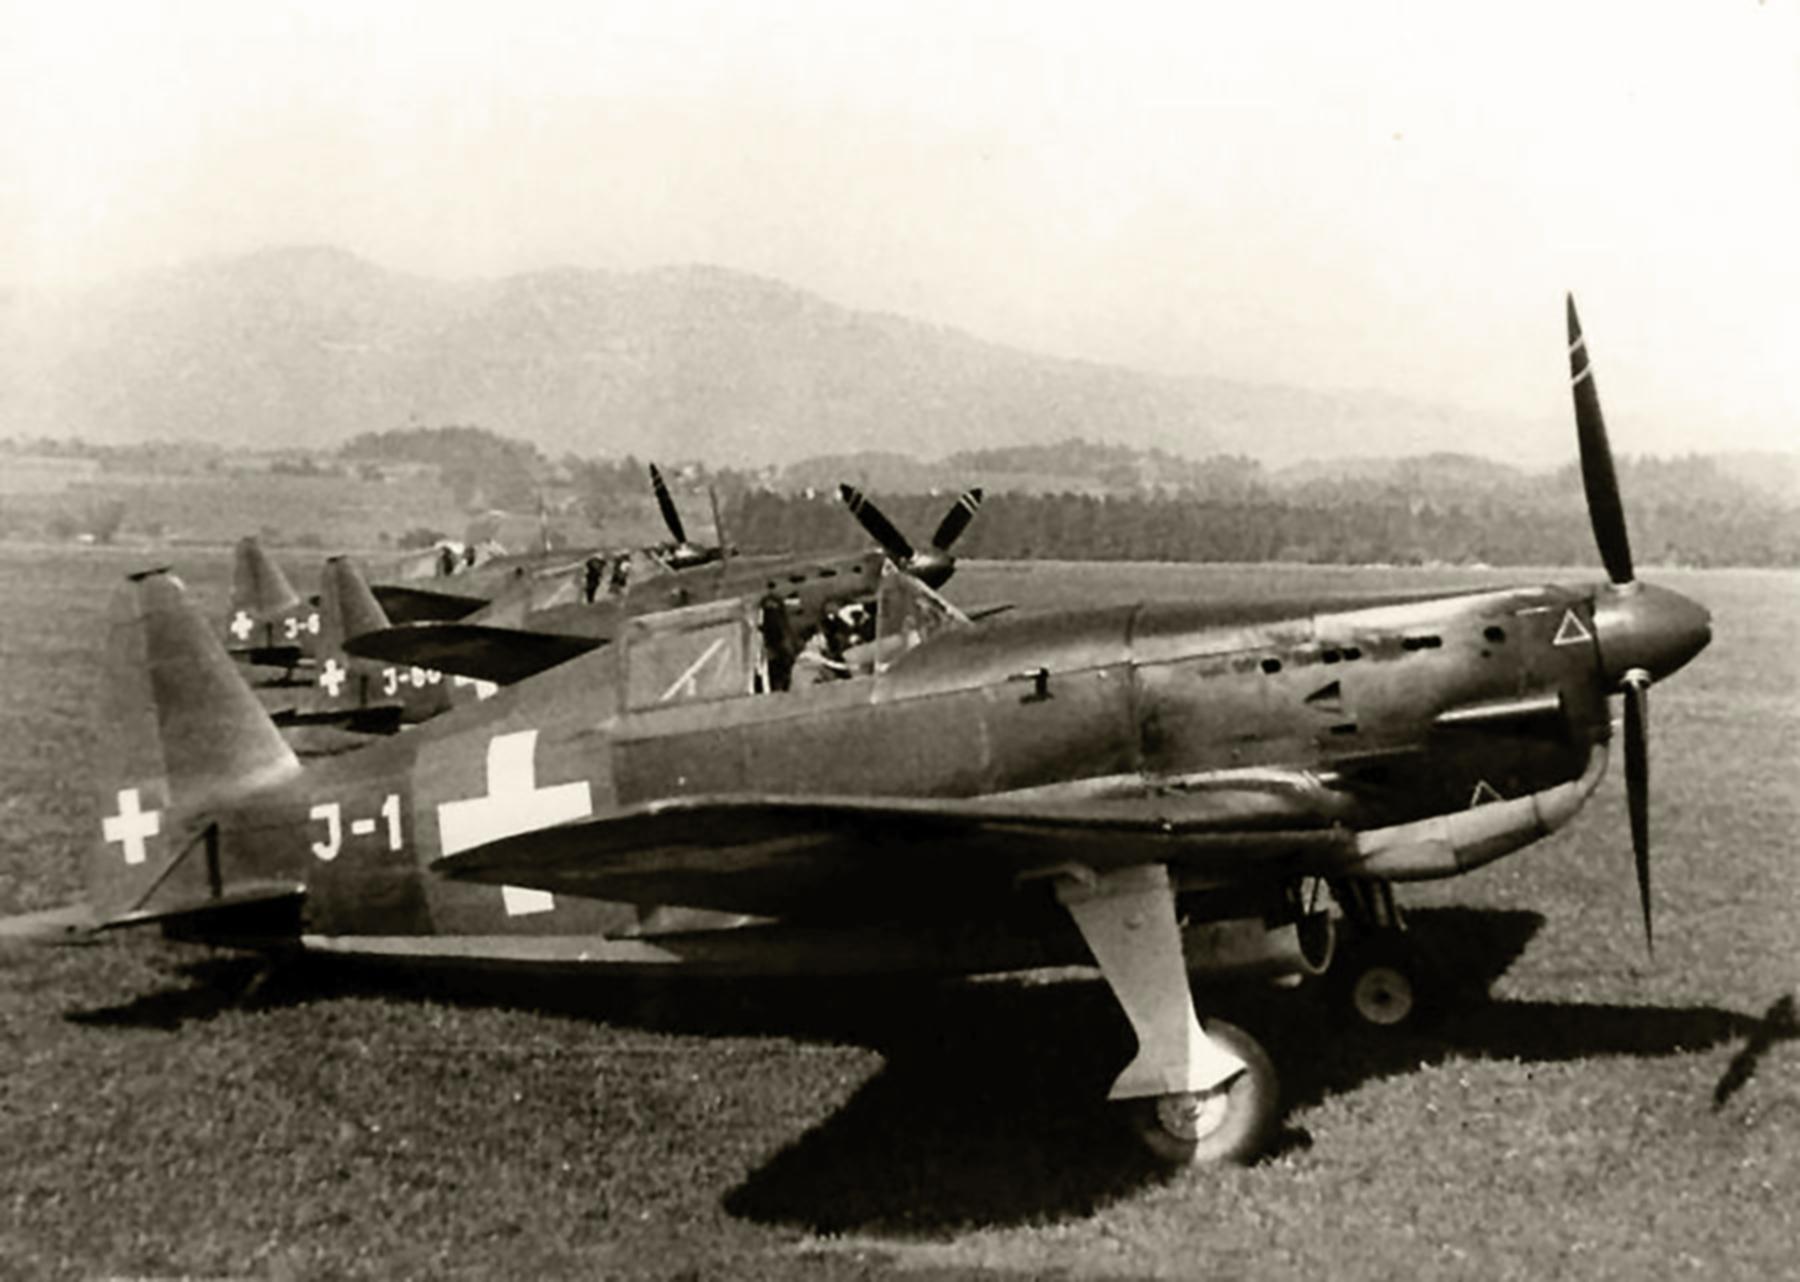 French built Morane Saulnier MS 406 J 1 Swiss AF web 01